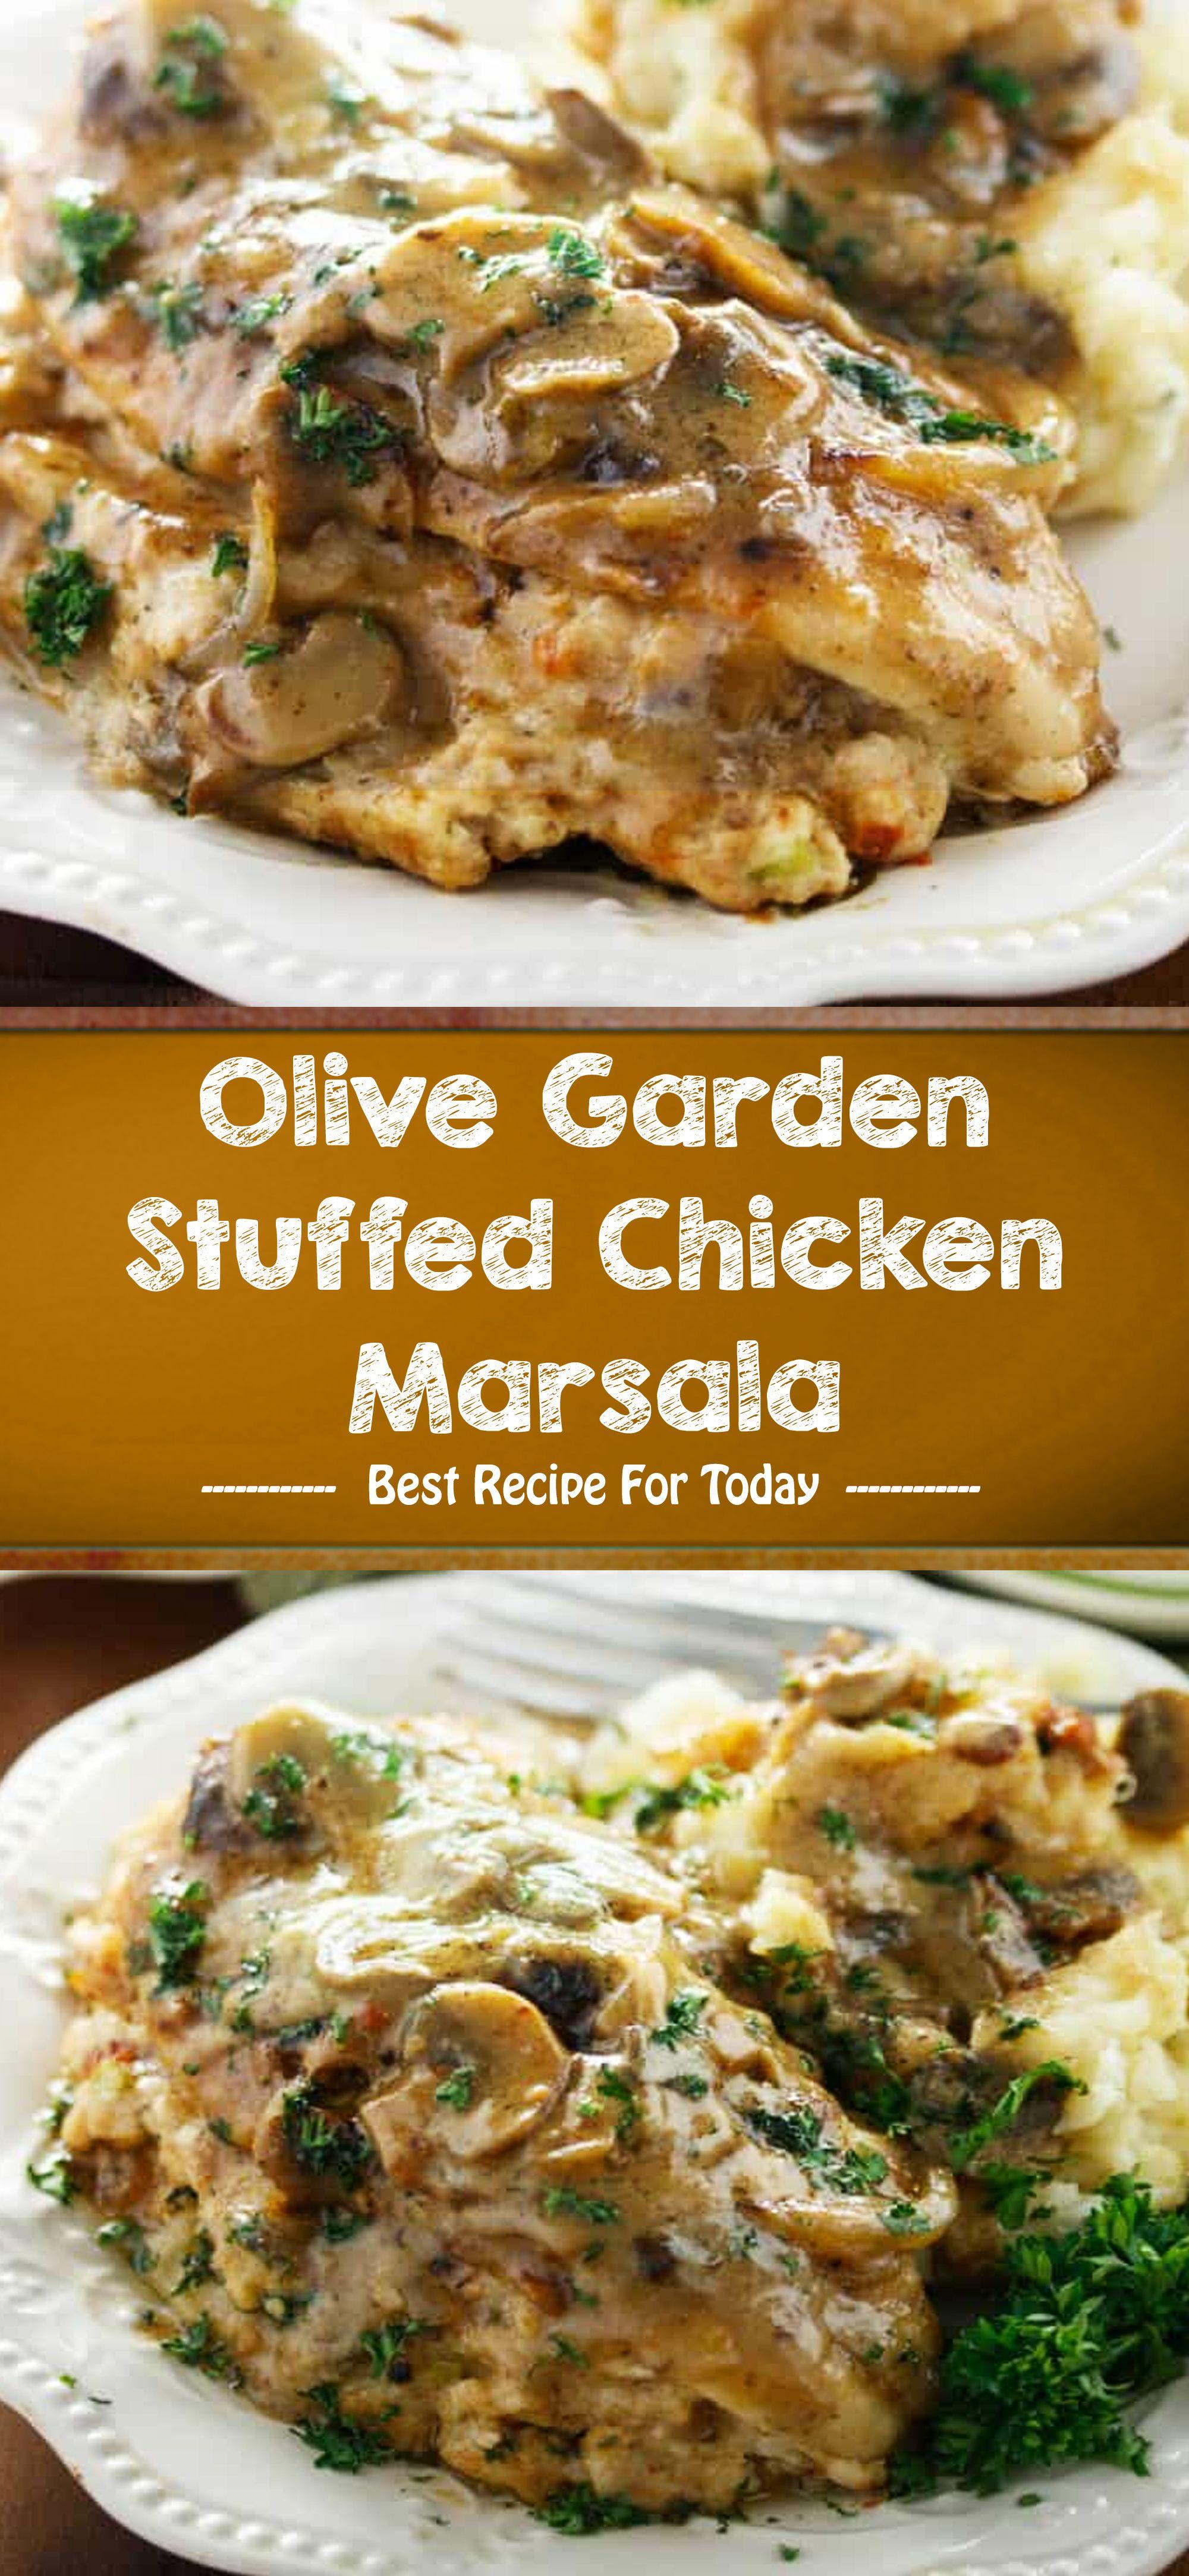 Olive Garden Stuffed Chicken Marsala In 2020 Grilled Chicken Recipes Chicken Recipes Chicken Crockpot Recipes